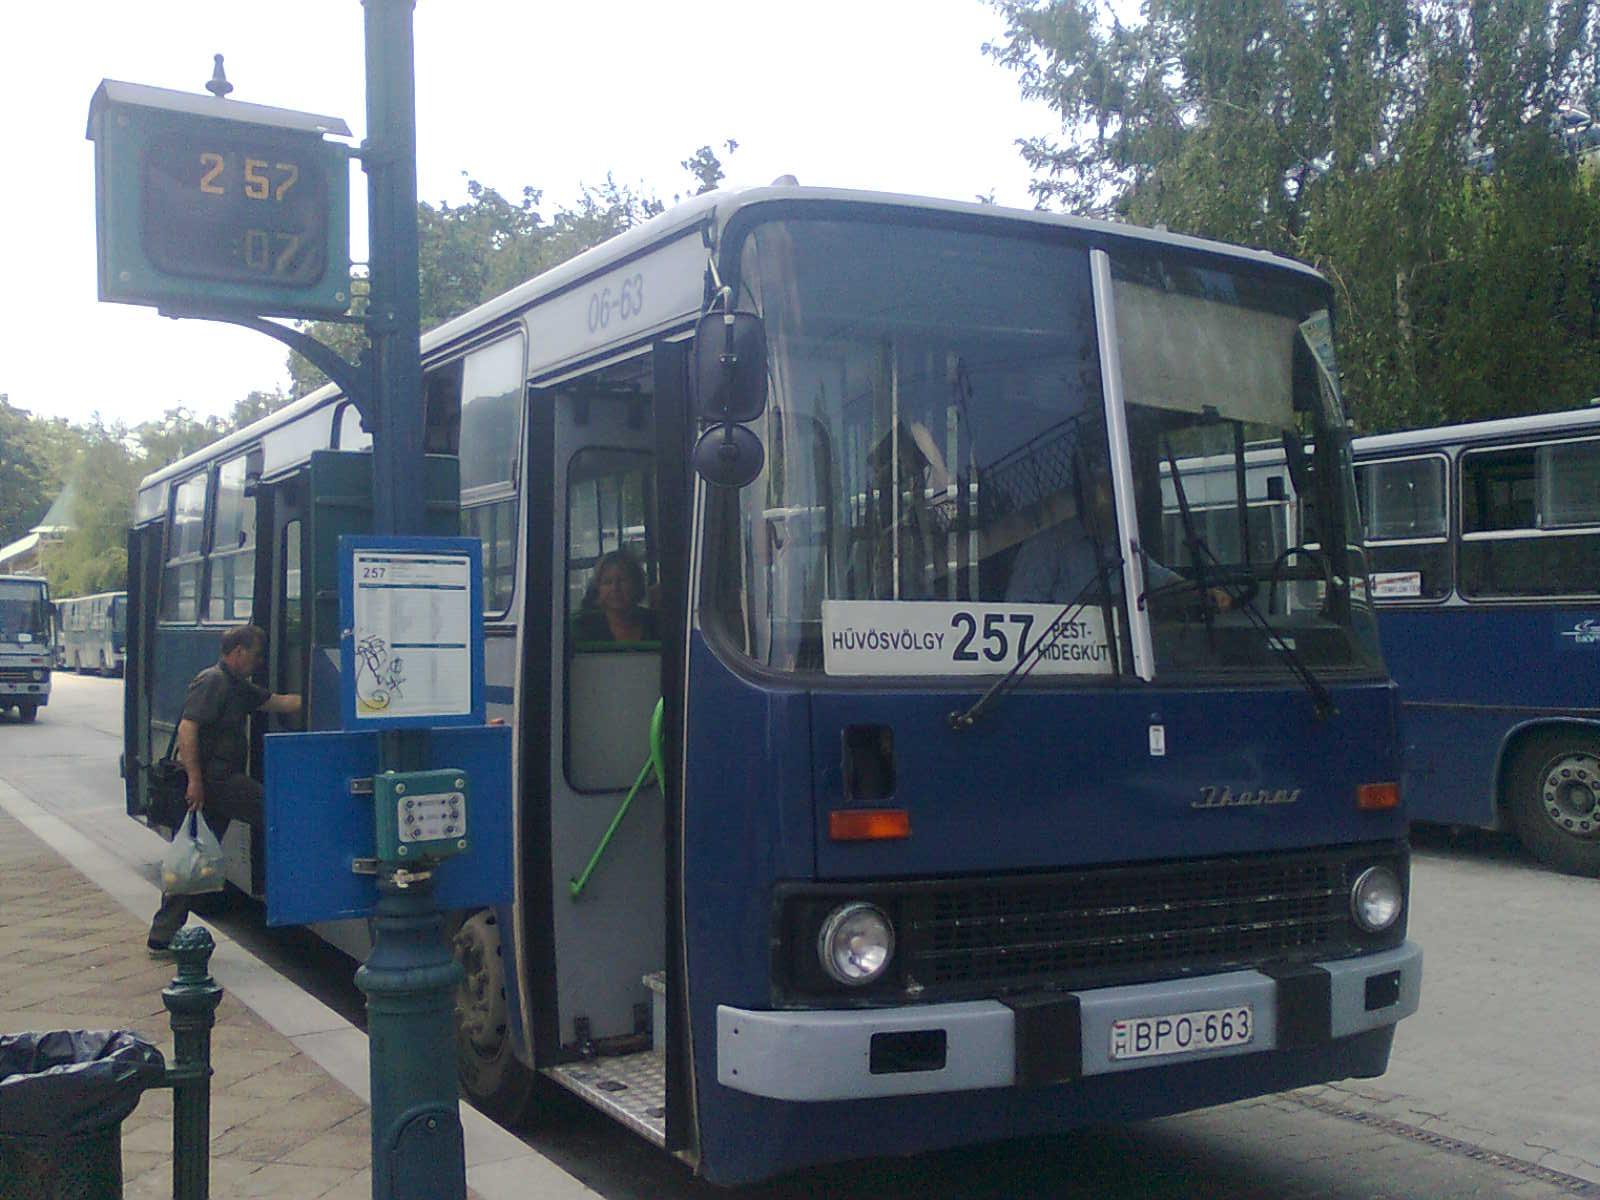 File:257-es busz (BPO-663).jpg